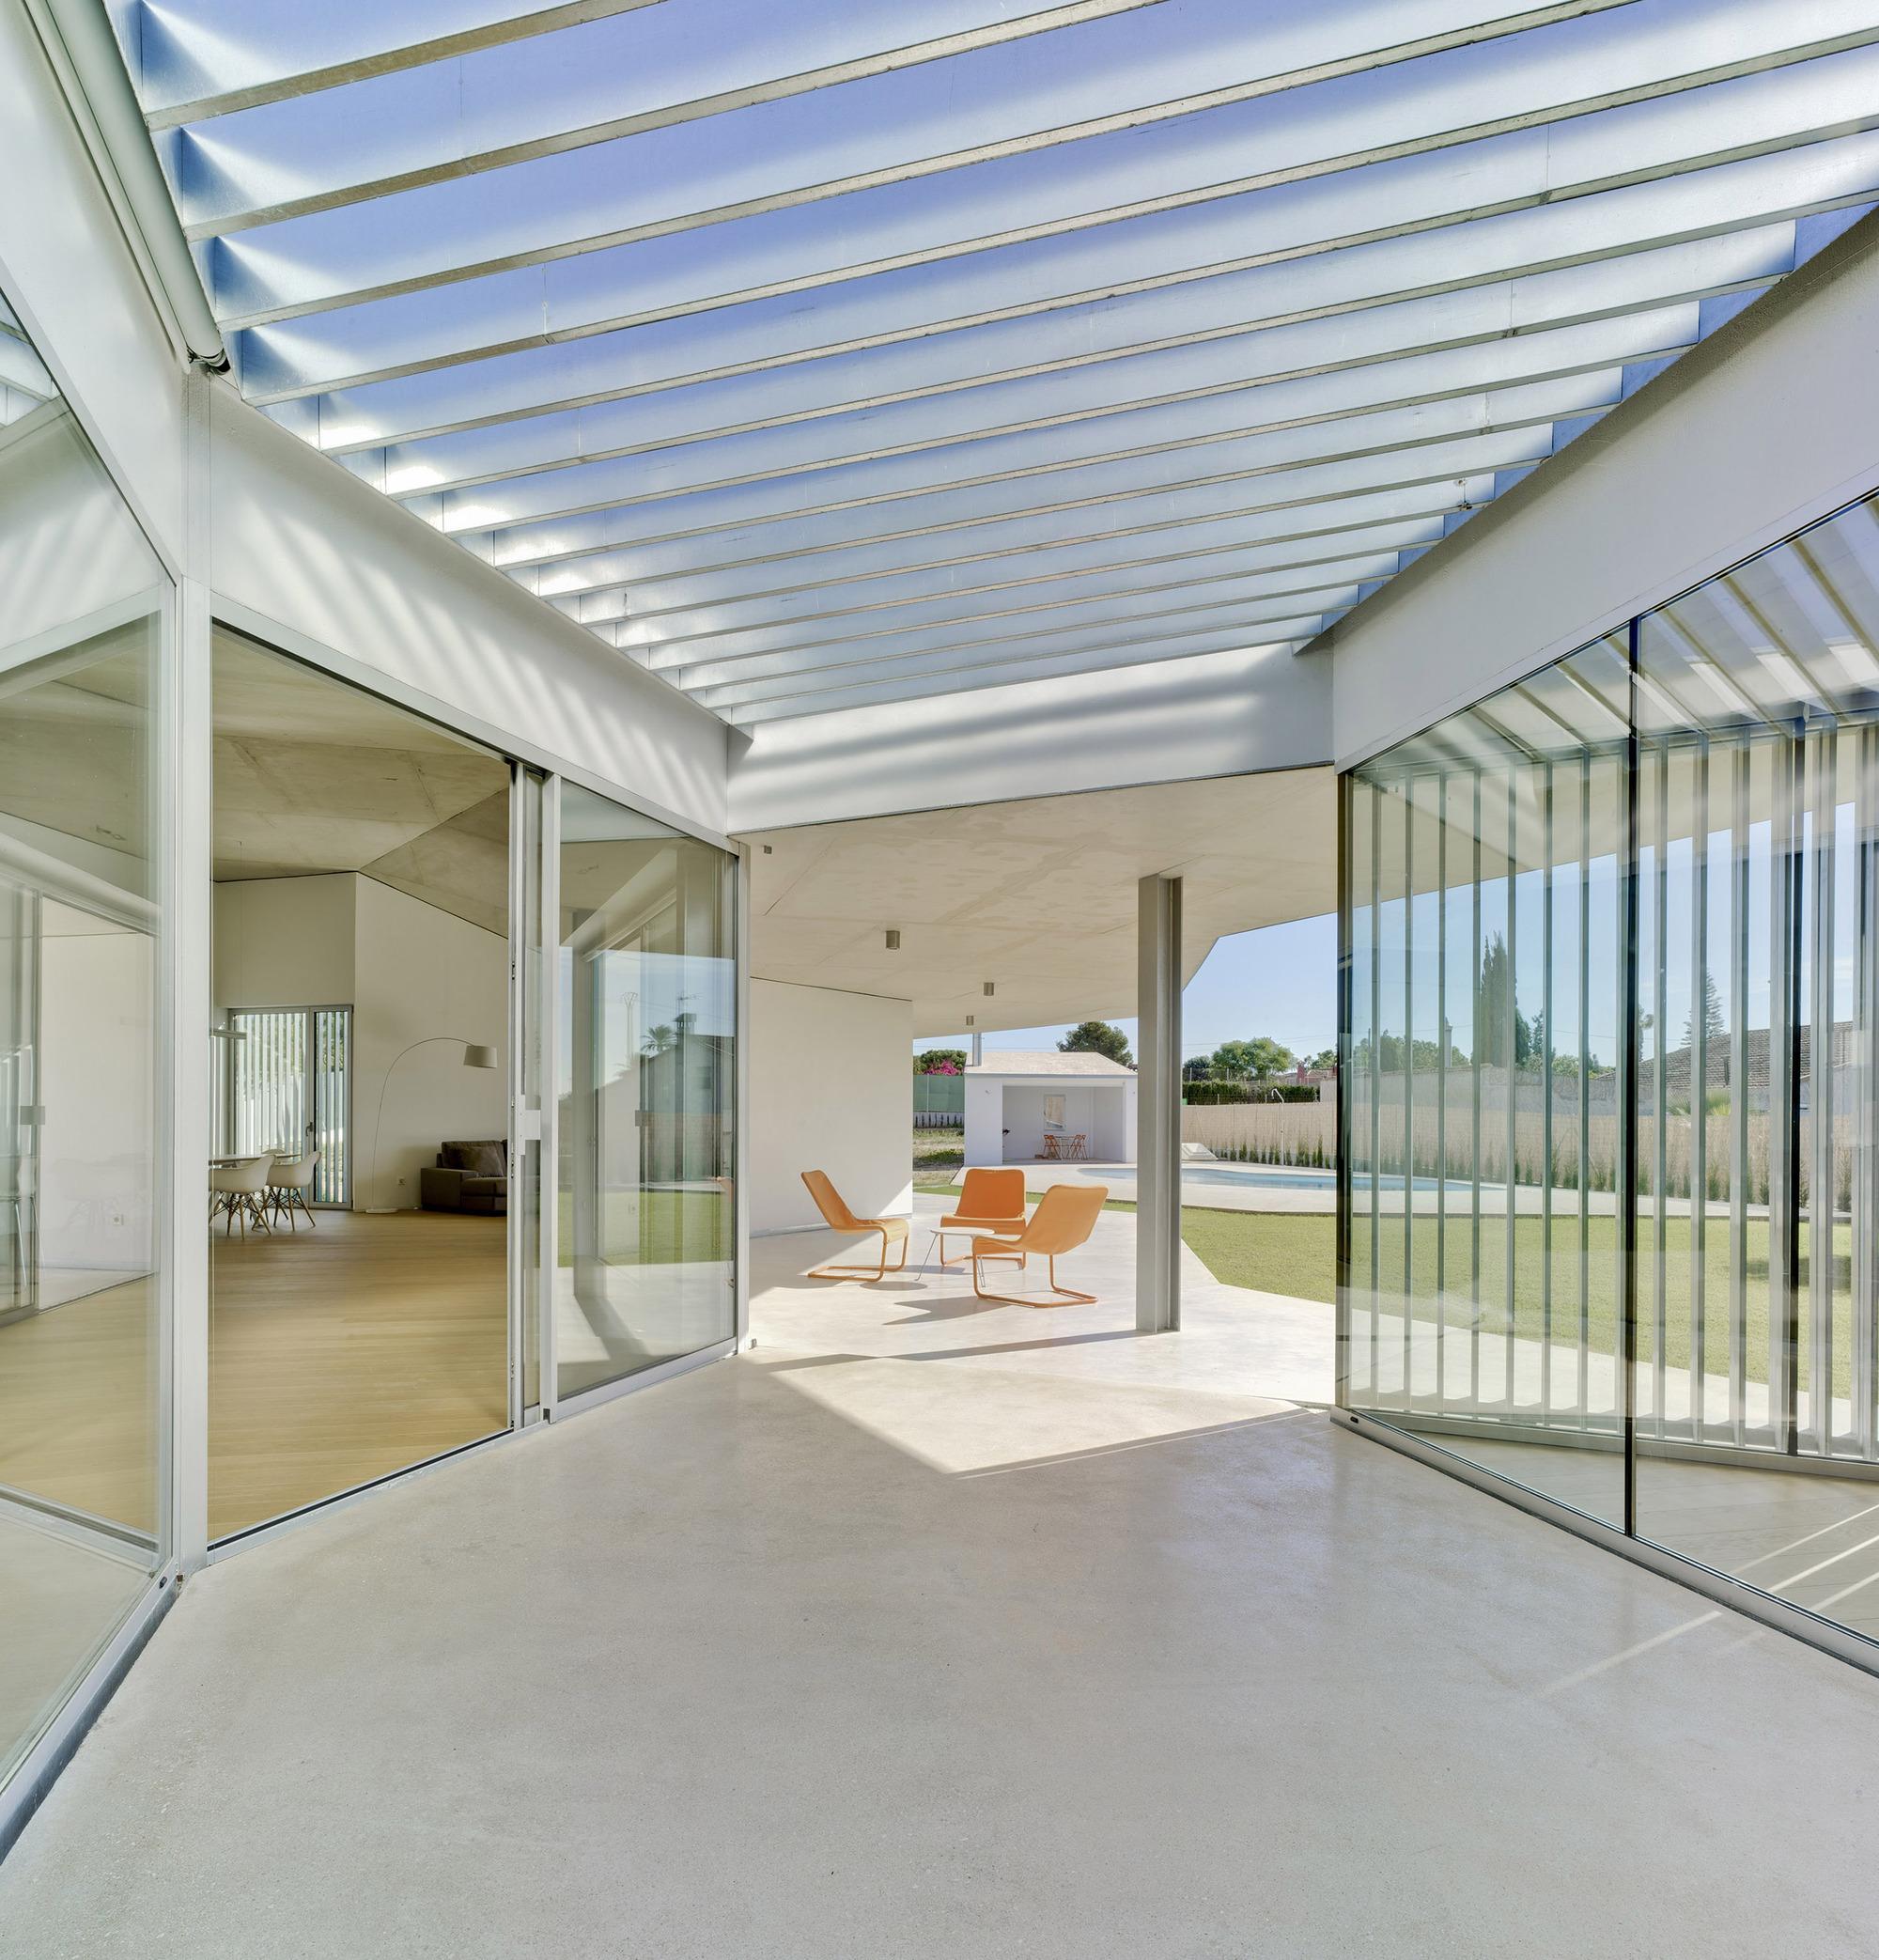 Gallery of Matola House  / Jaime Sepulcre Bernand  - 1